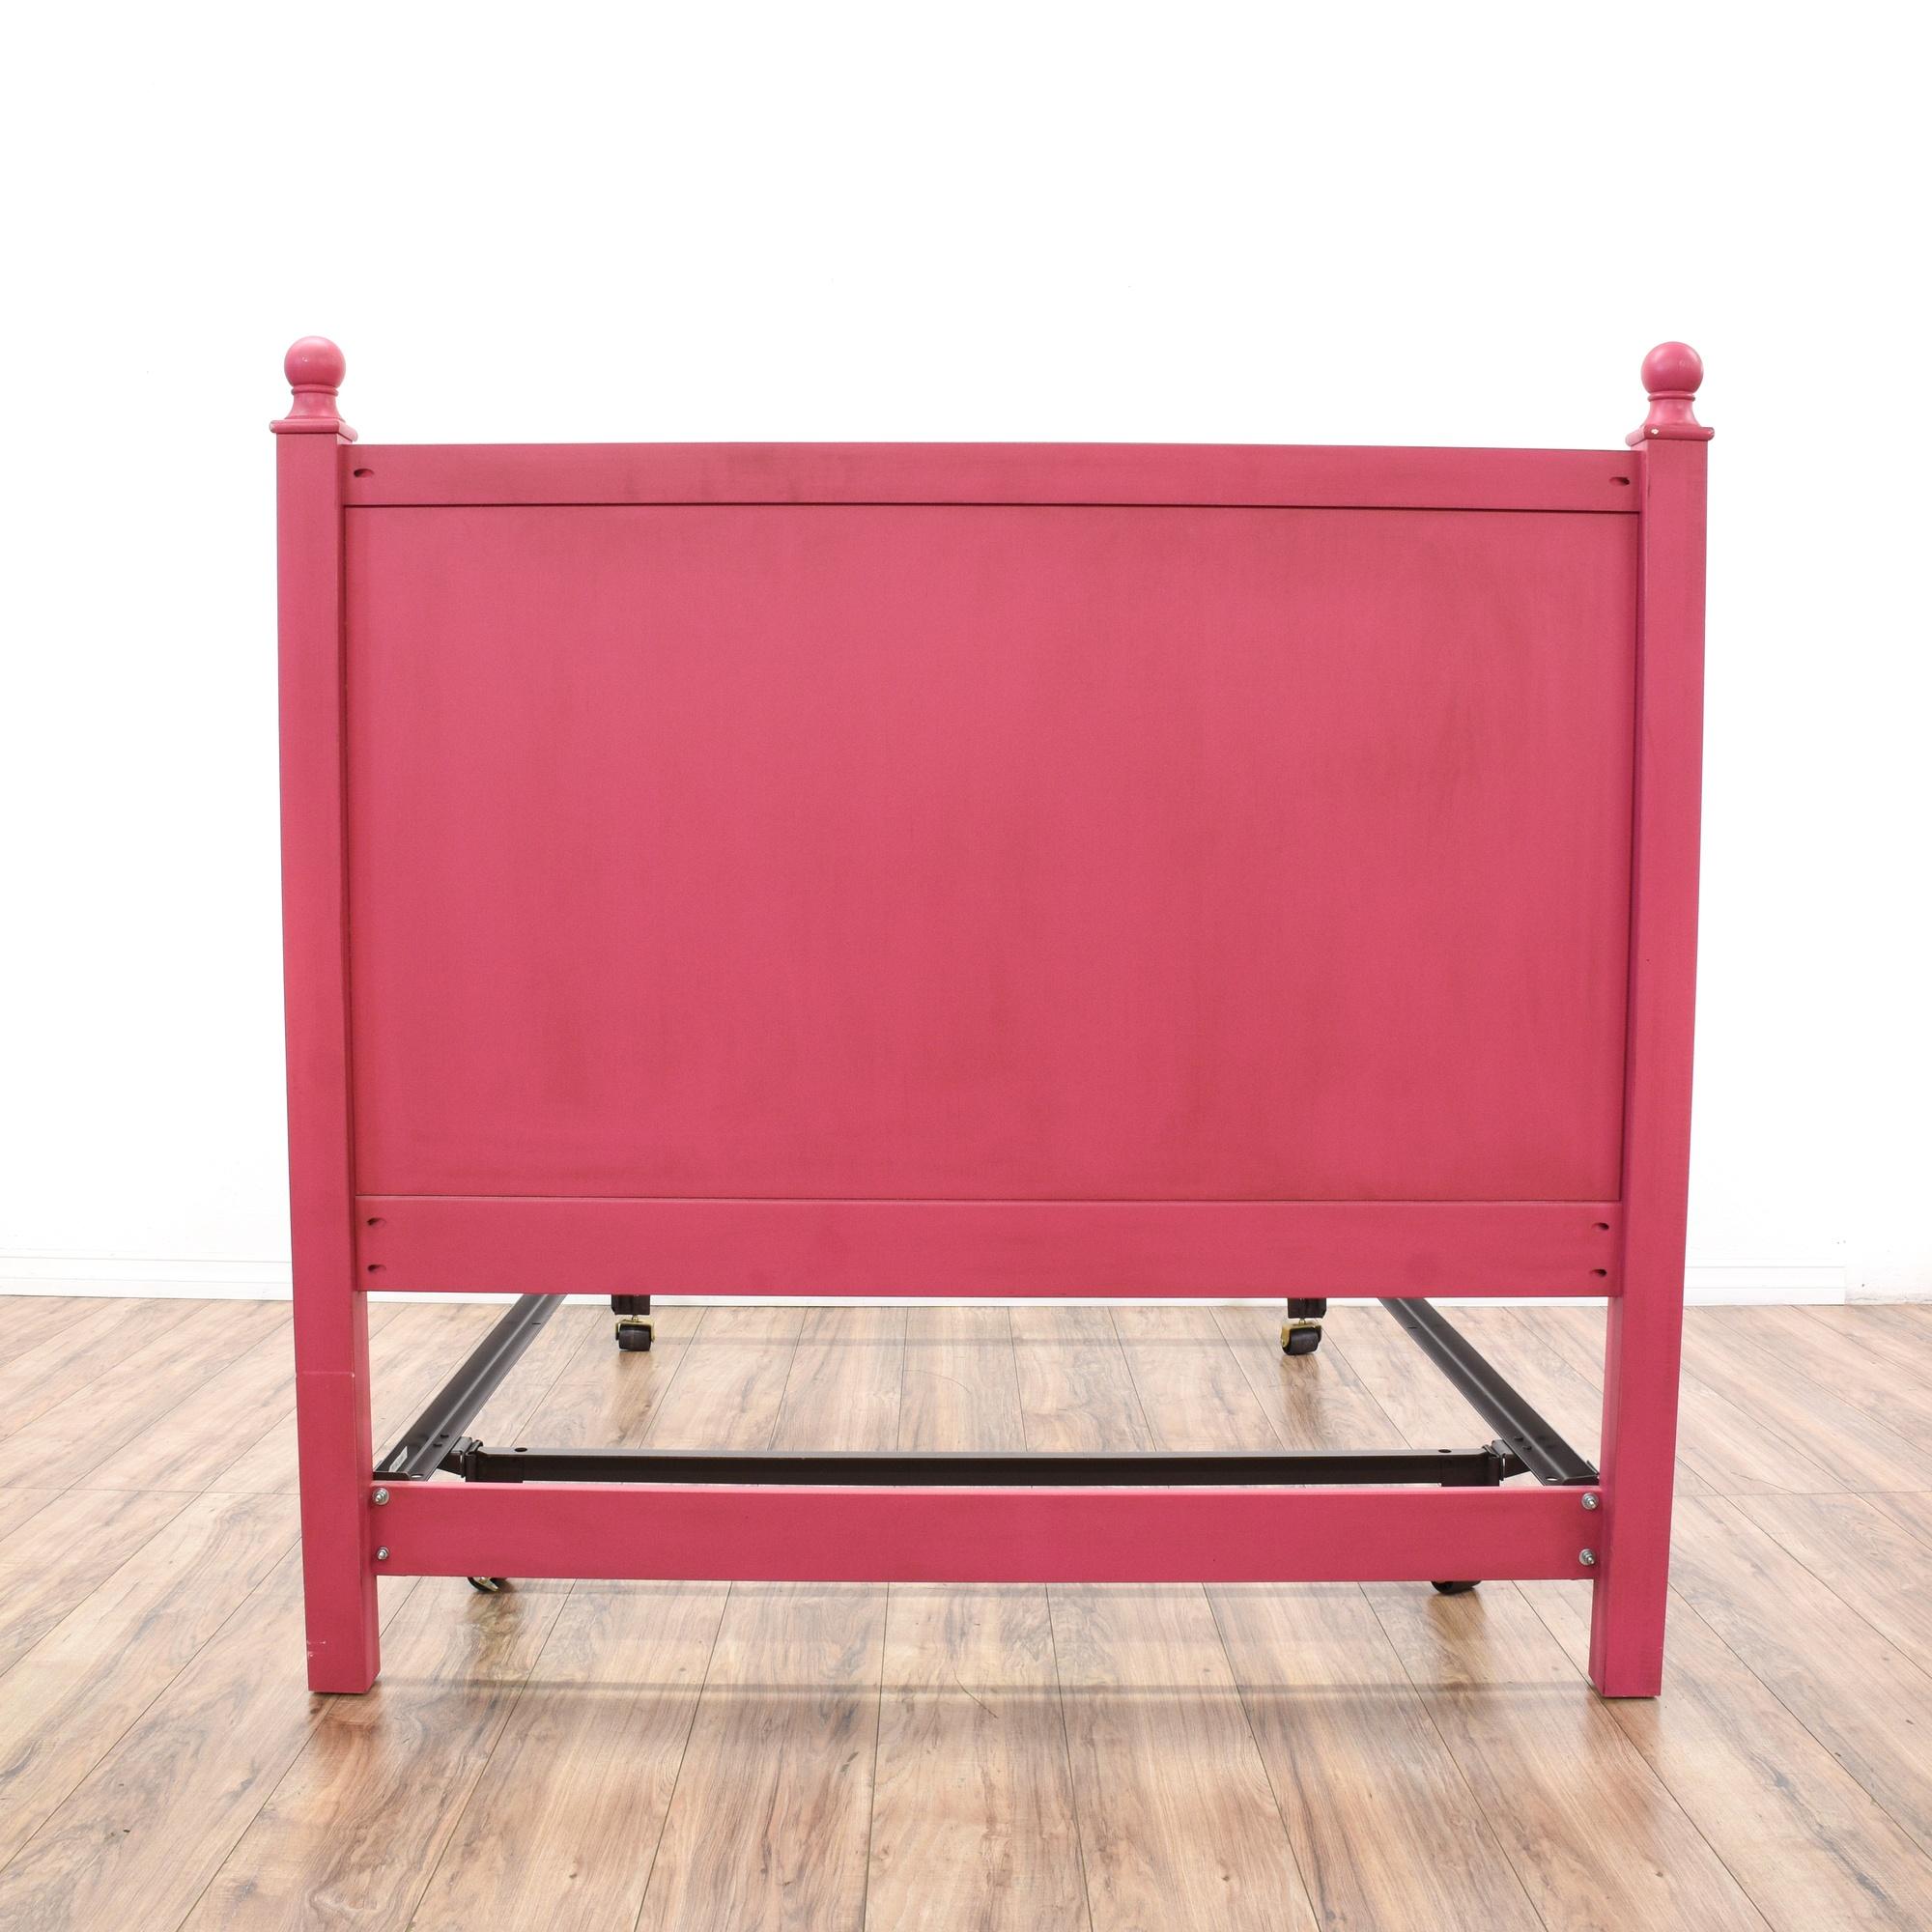 Ethan allen full fuschia pink bed frame loveseat vintage furniture san diego los angeles - Ethan allen metal bed ...